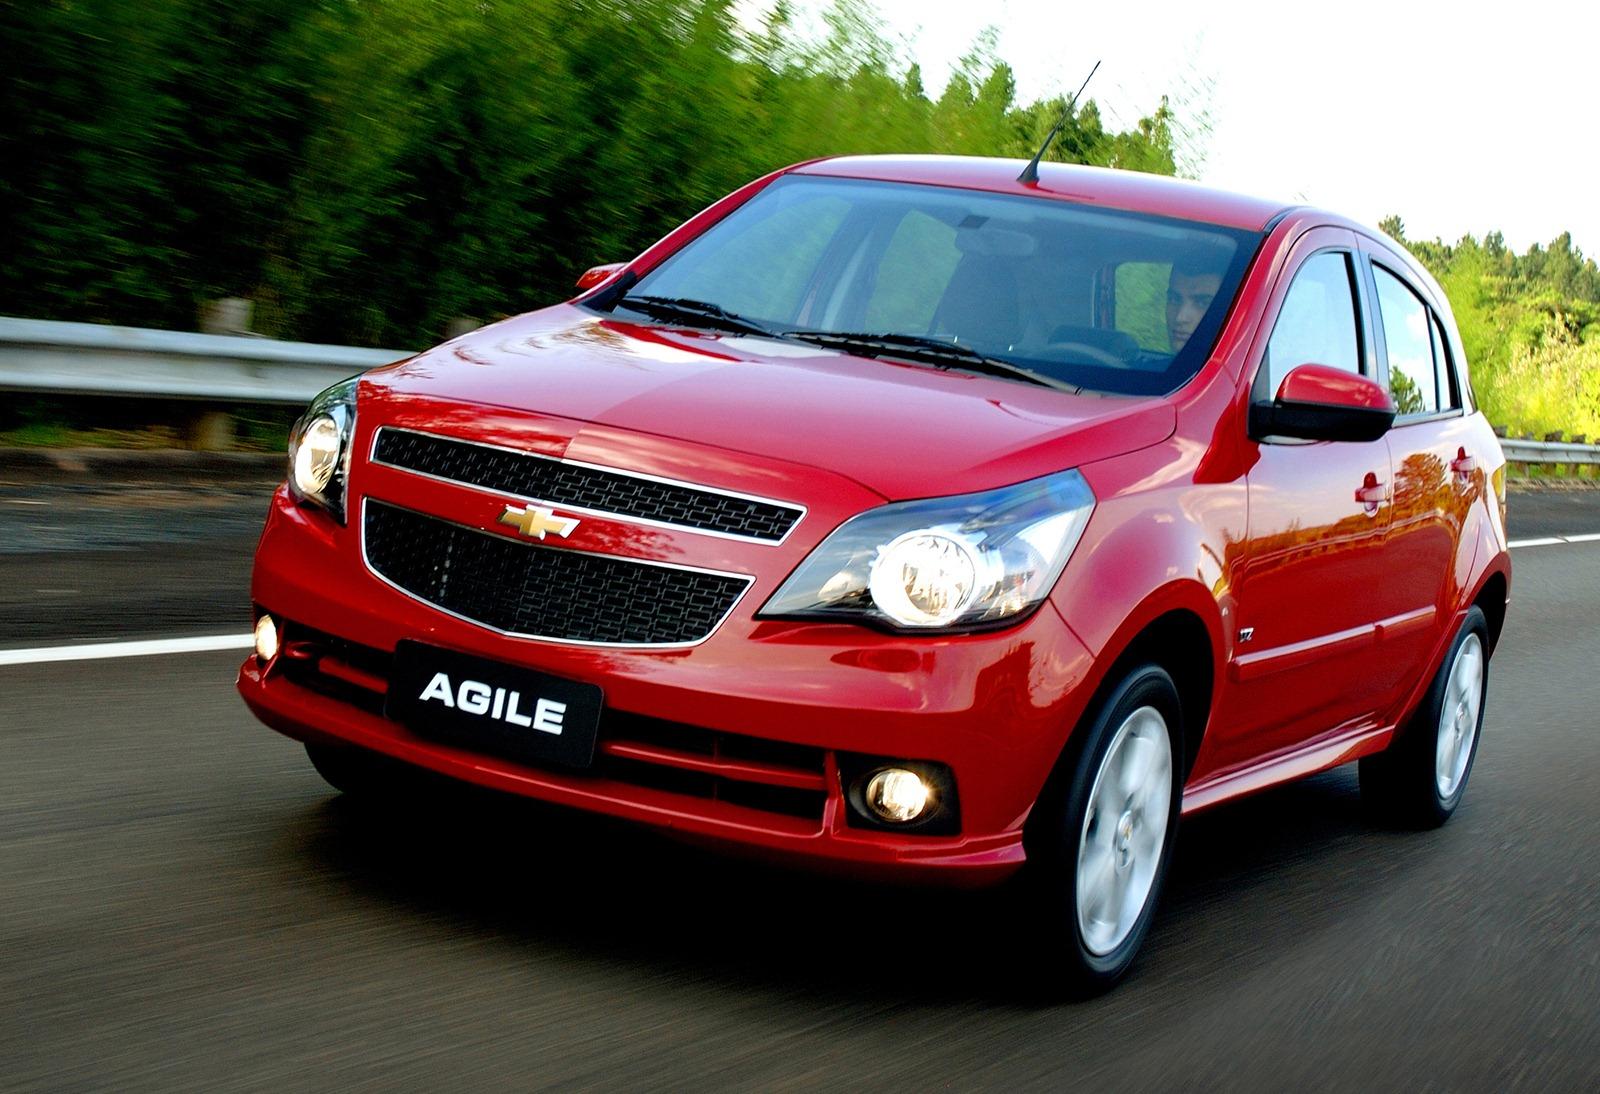 [2011-Chevrolet-Agile-B44.jp%255B5%255D.jpg]